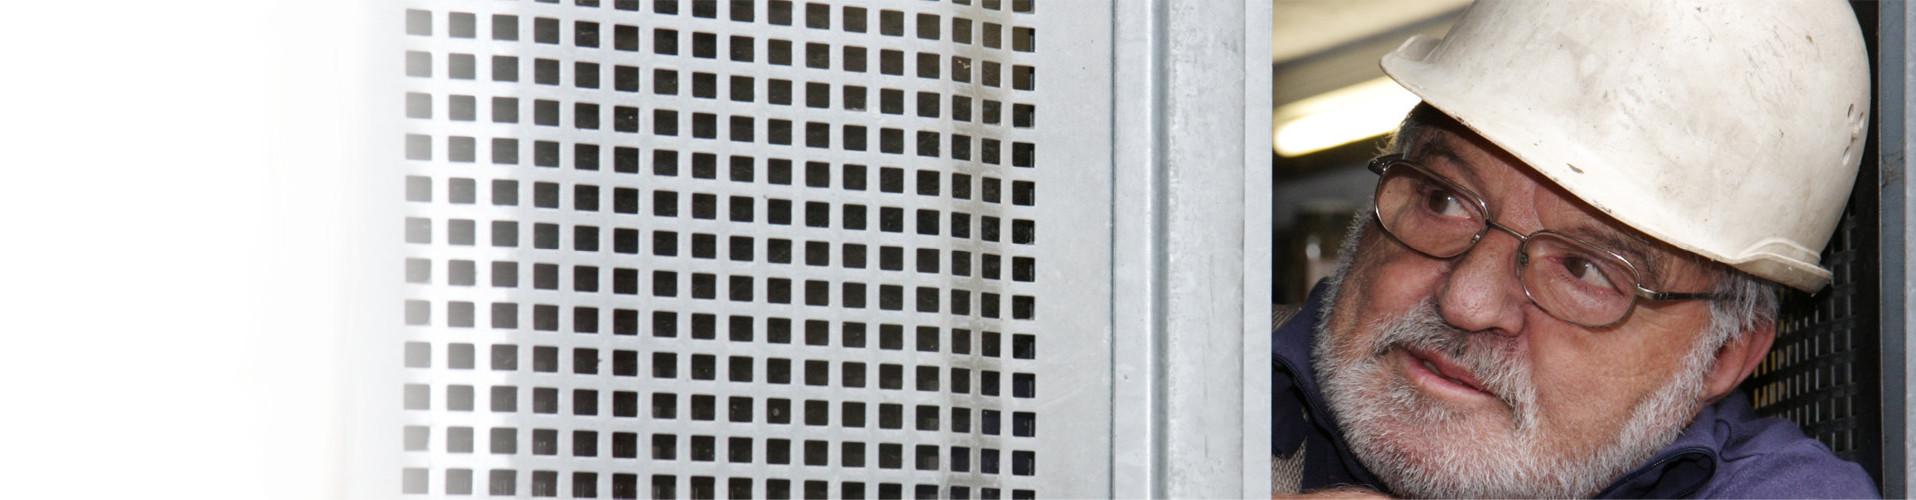 Älterer Arbeiter blickt durch ein Wartungsgitter © Irina Fischer, stock.adobe.com